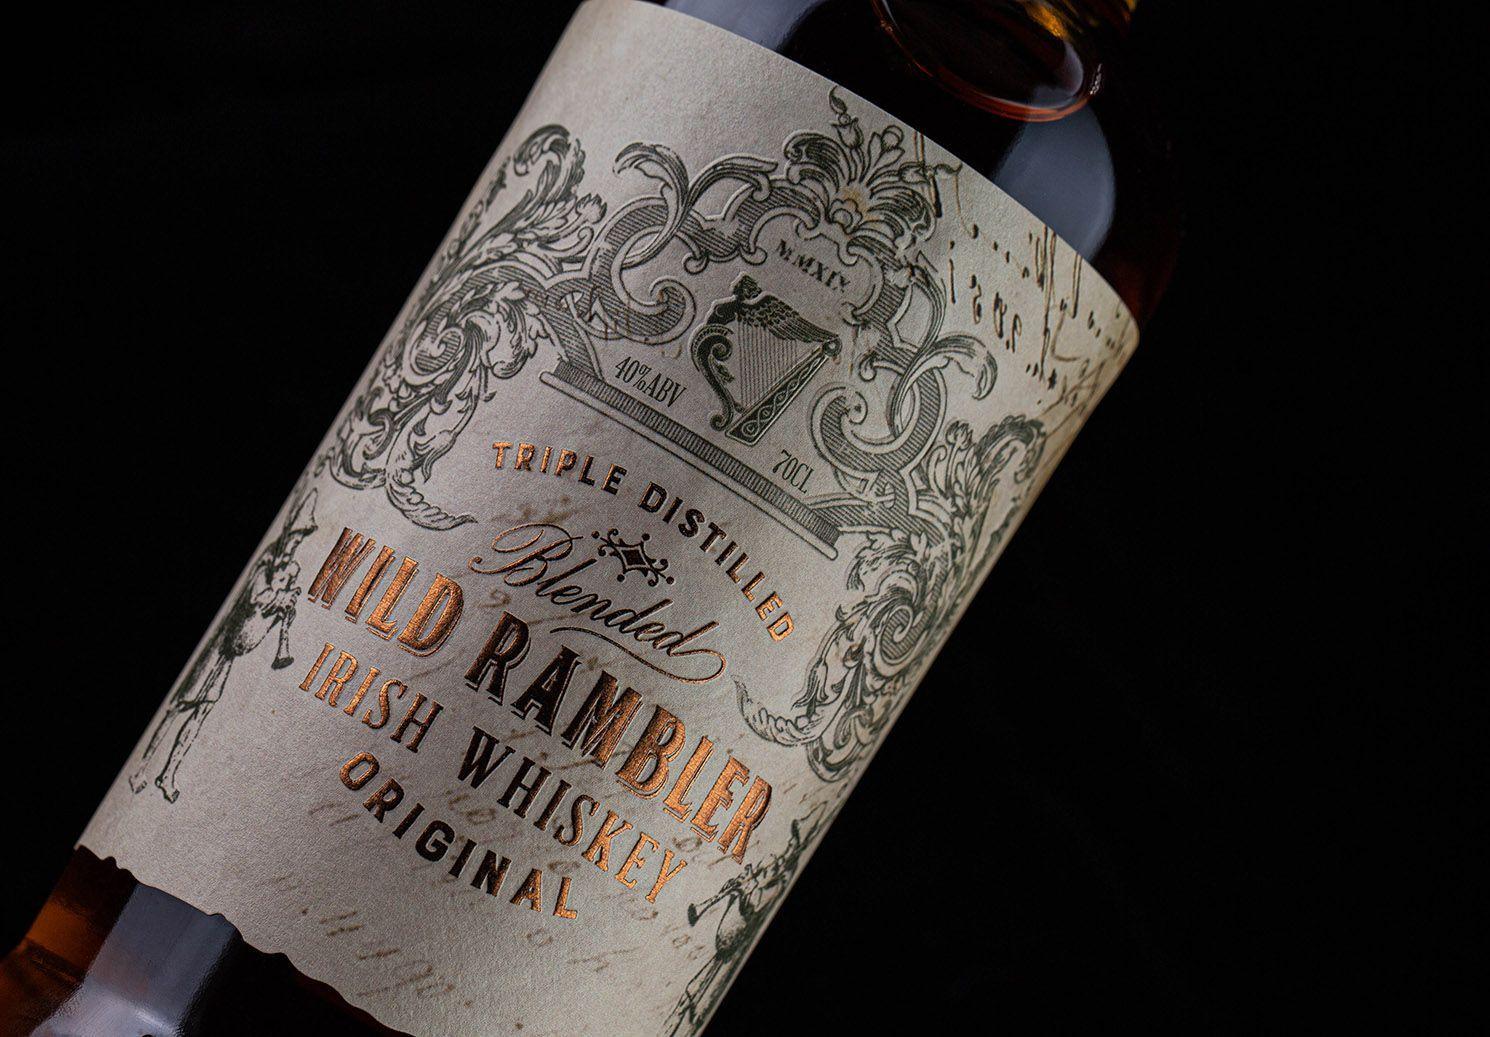 Thinkboldstudio Wild Rambler World Brand Design Society Triple Distilled And Non Chill Filtered Wild Rambler Irish Whiskey Has Been Produced Using Only T With Images Irish Whiskey Whiskey Packaging